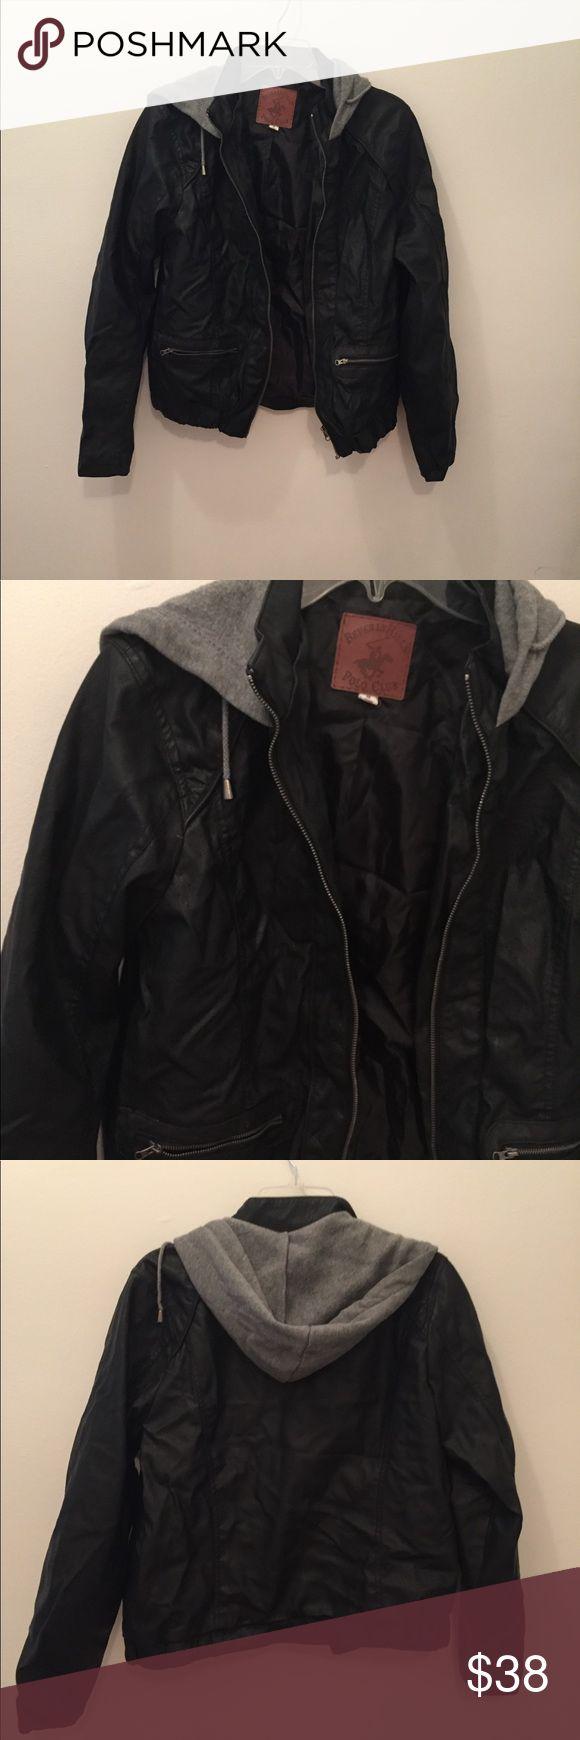 Rare vintage polo leather jacket Gorgeous leather jacket, with grey hood Jackets & Coats